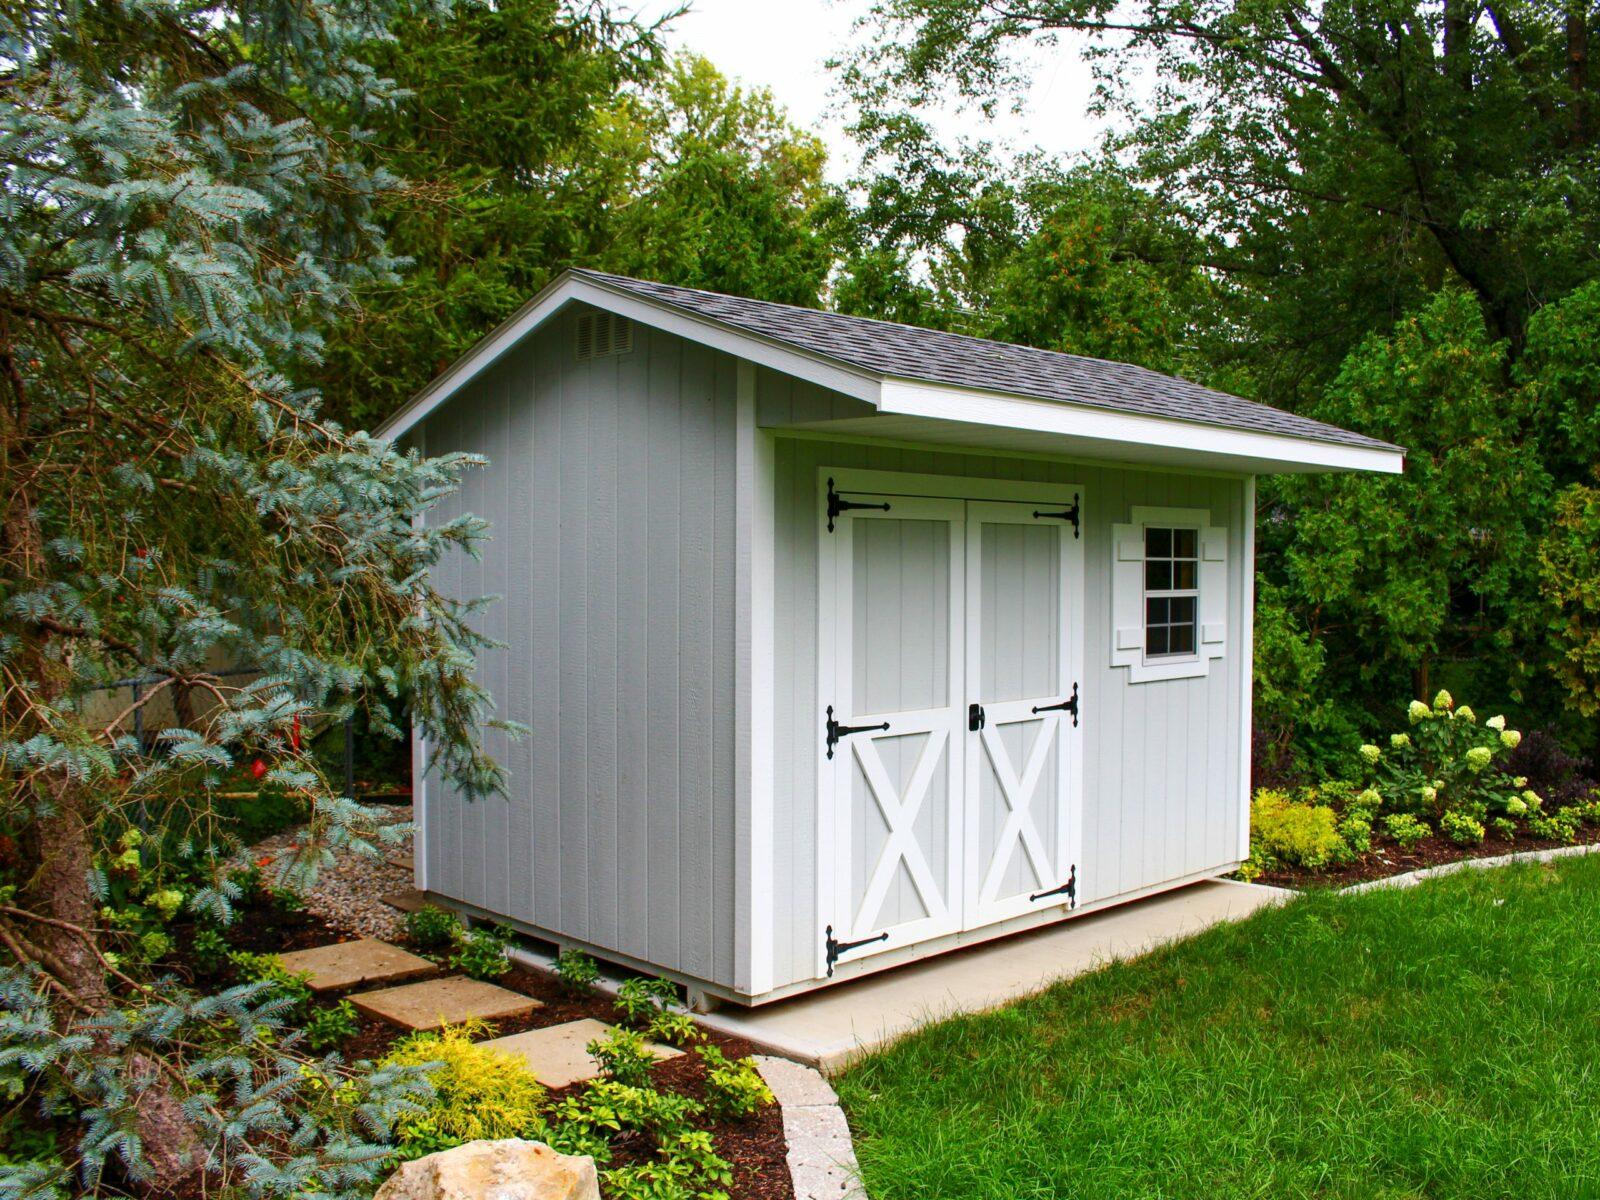 stunning quaker garden shed for sale near columbus ohio